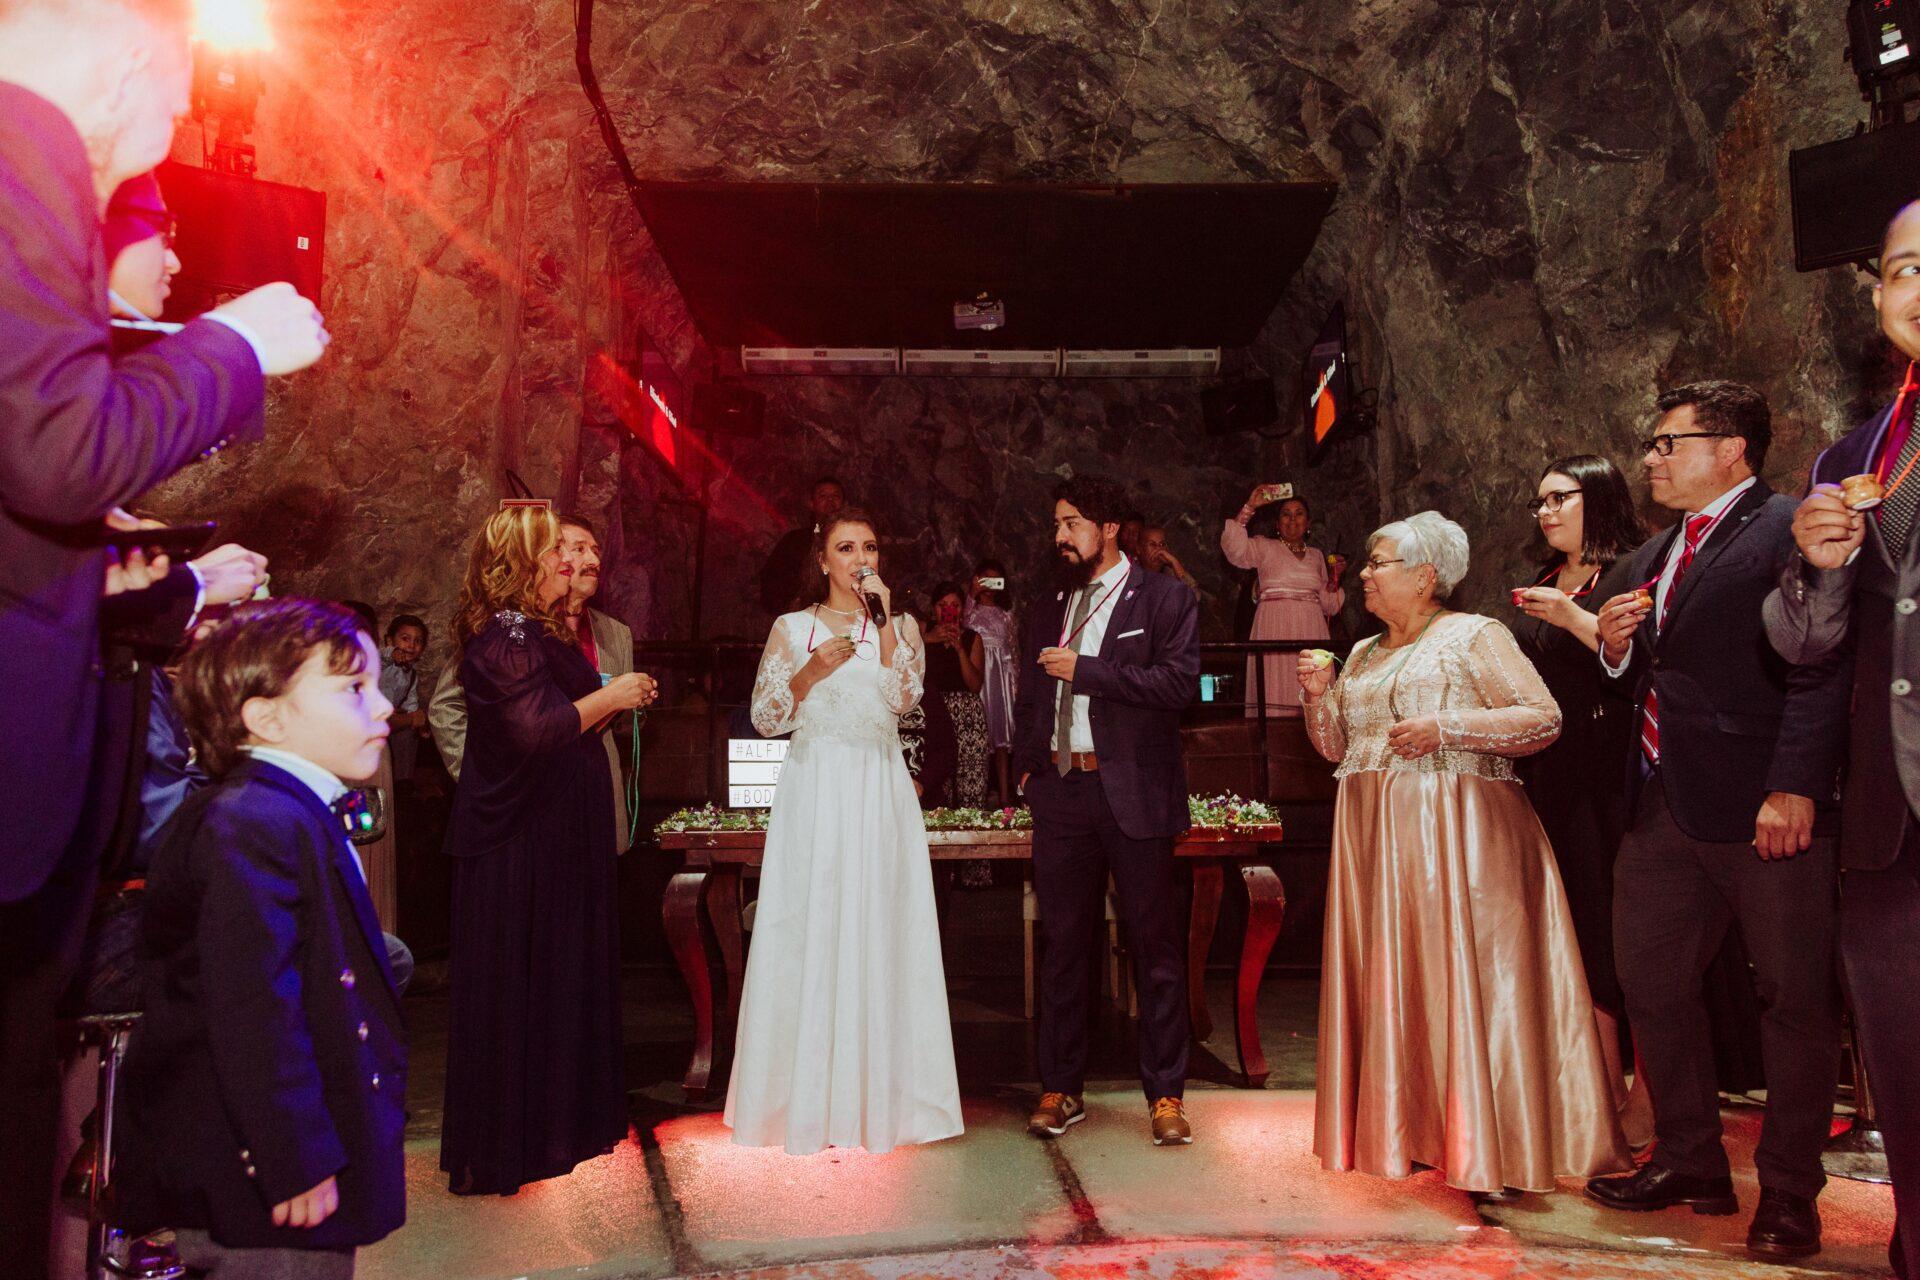 javier_noriega_fotografo_bodas_la_mina_club_zacatecas_wedding_photographer14